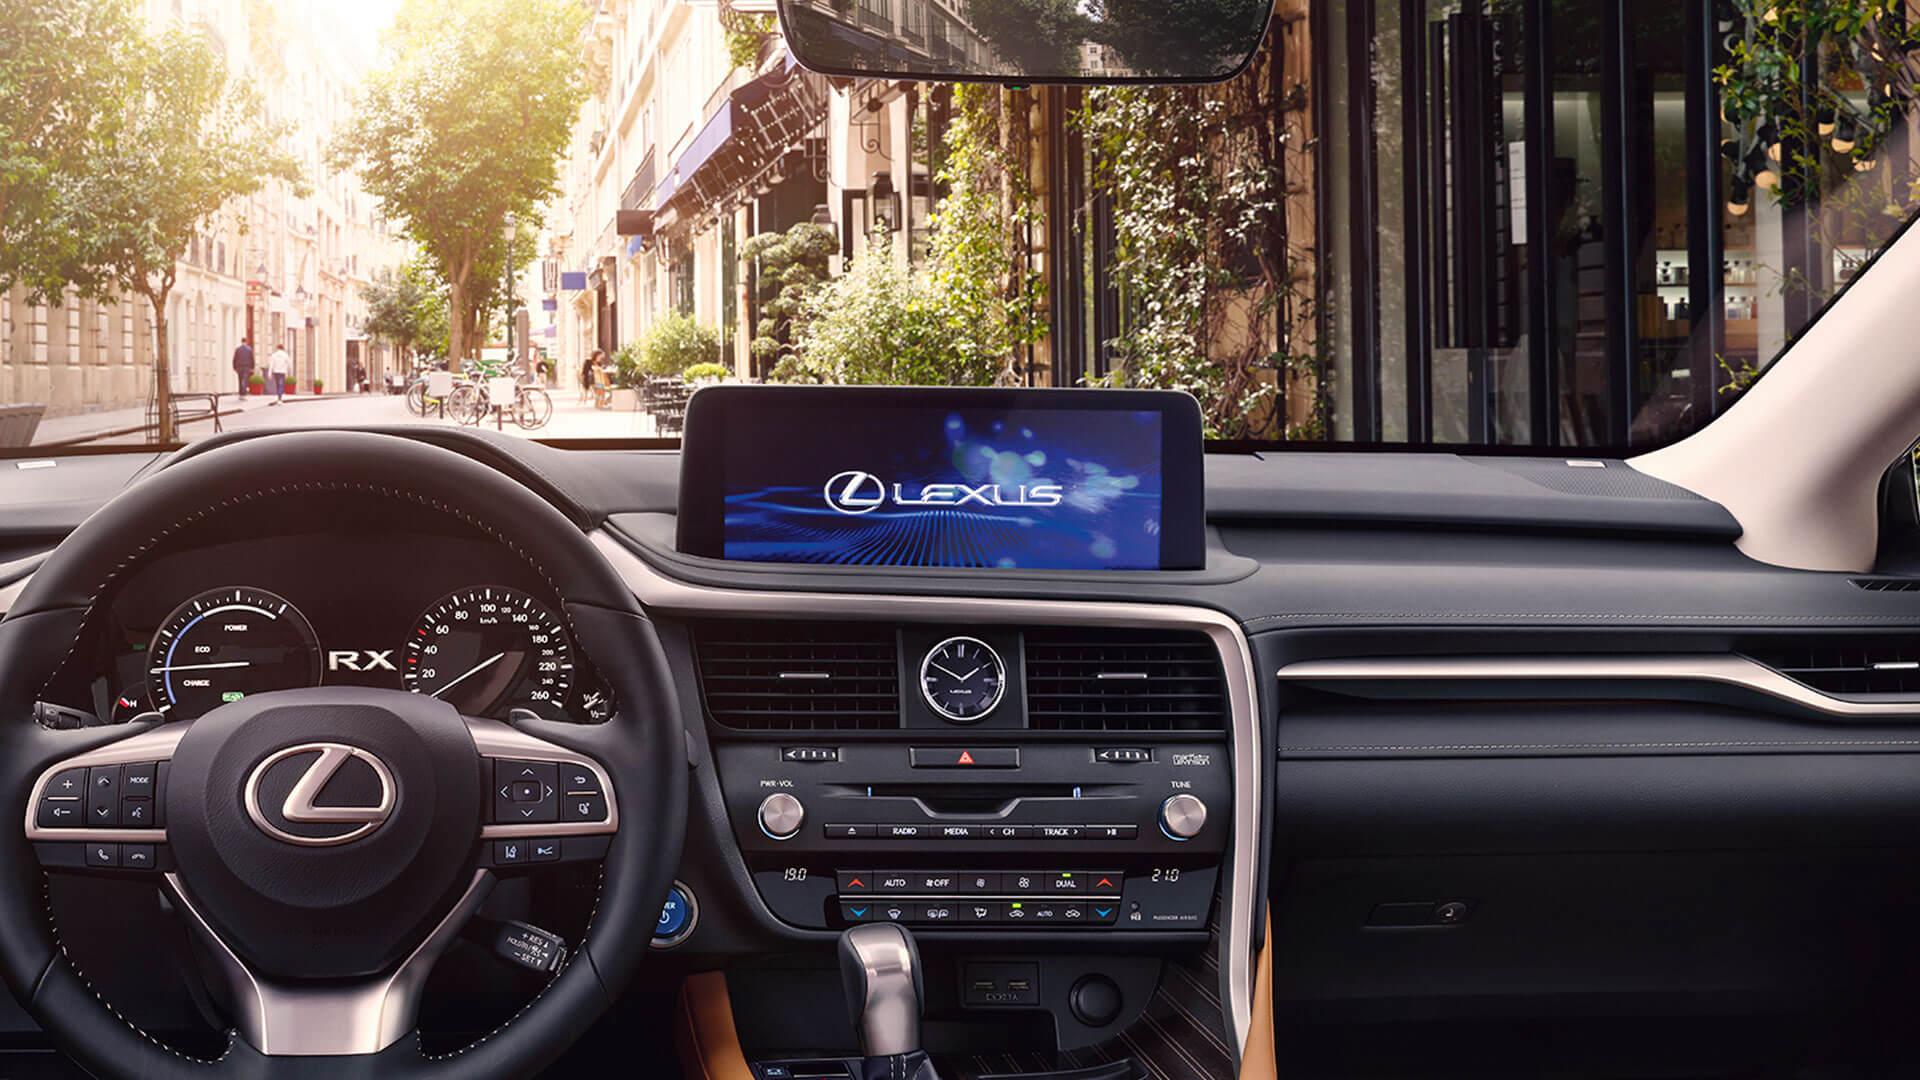 2019 lexus rx hotspot extra large touchscreen